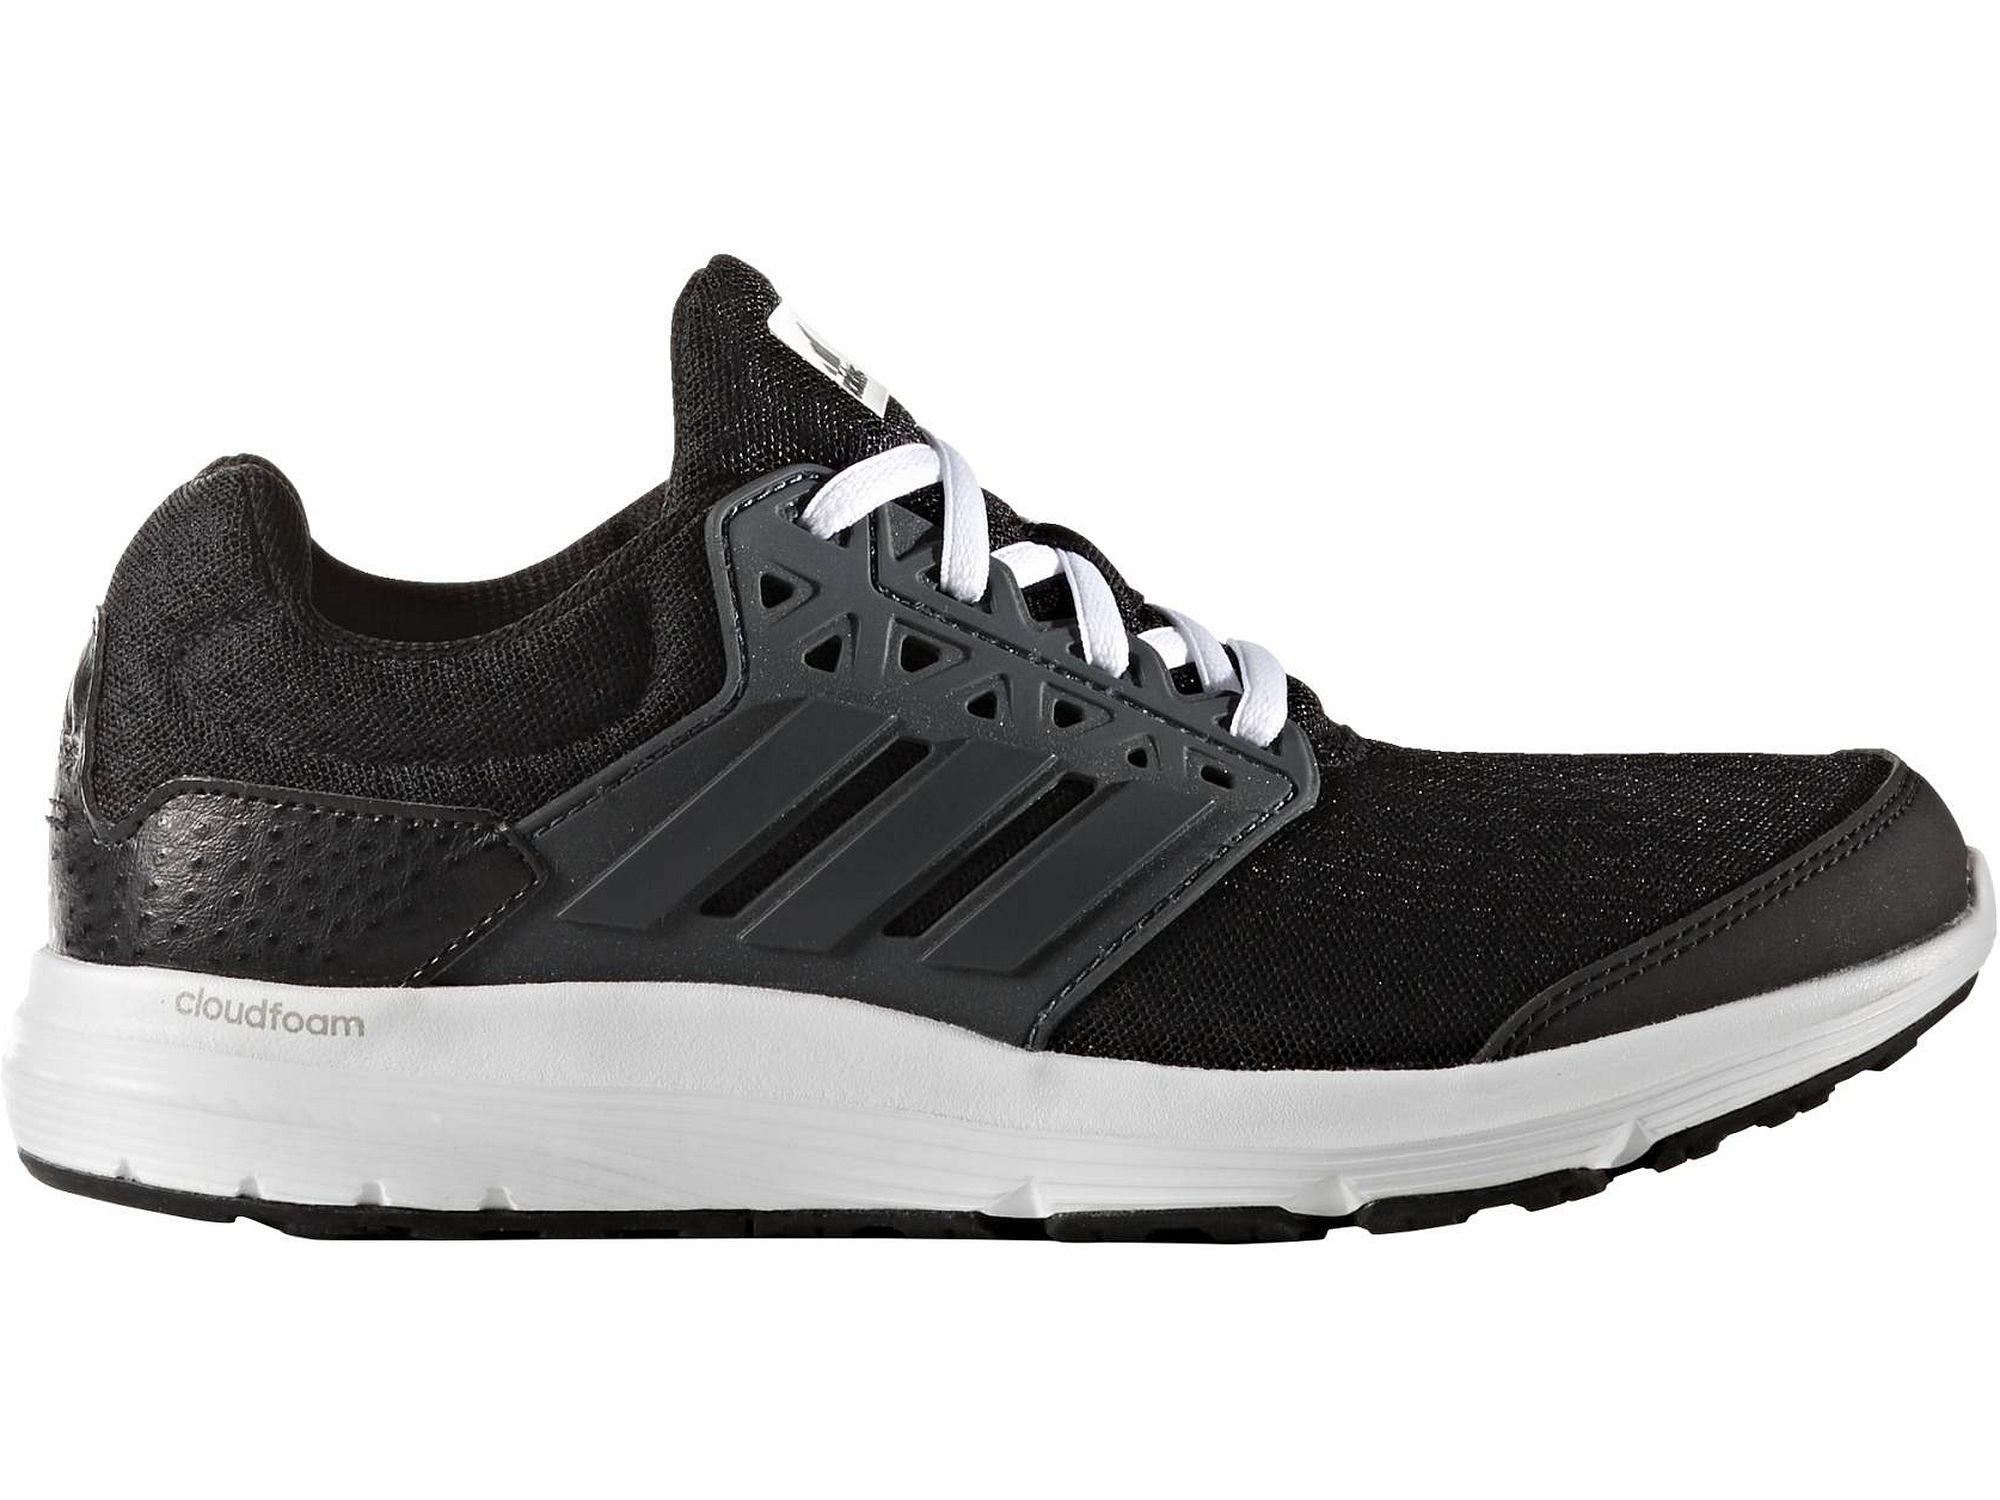 cheap for discount d7e7c 43f80 Adidas GALAXY 3 WOMEN (39 13) Buty Damskie